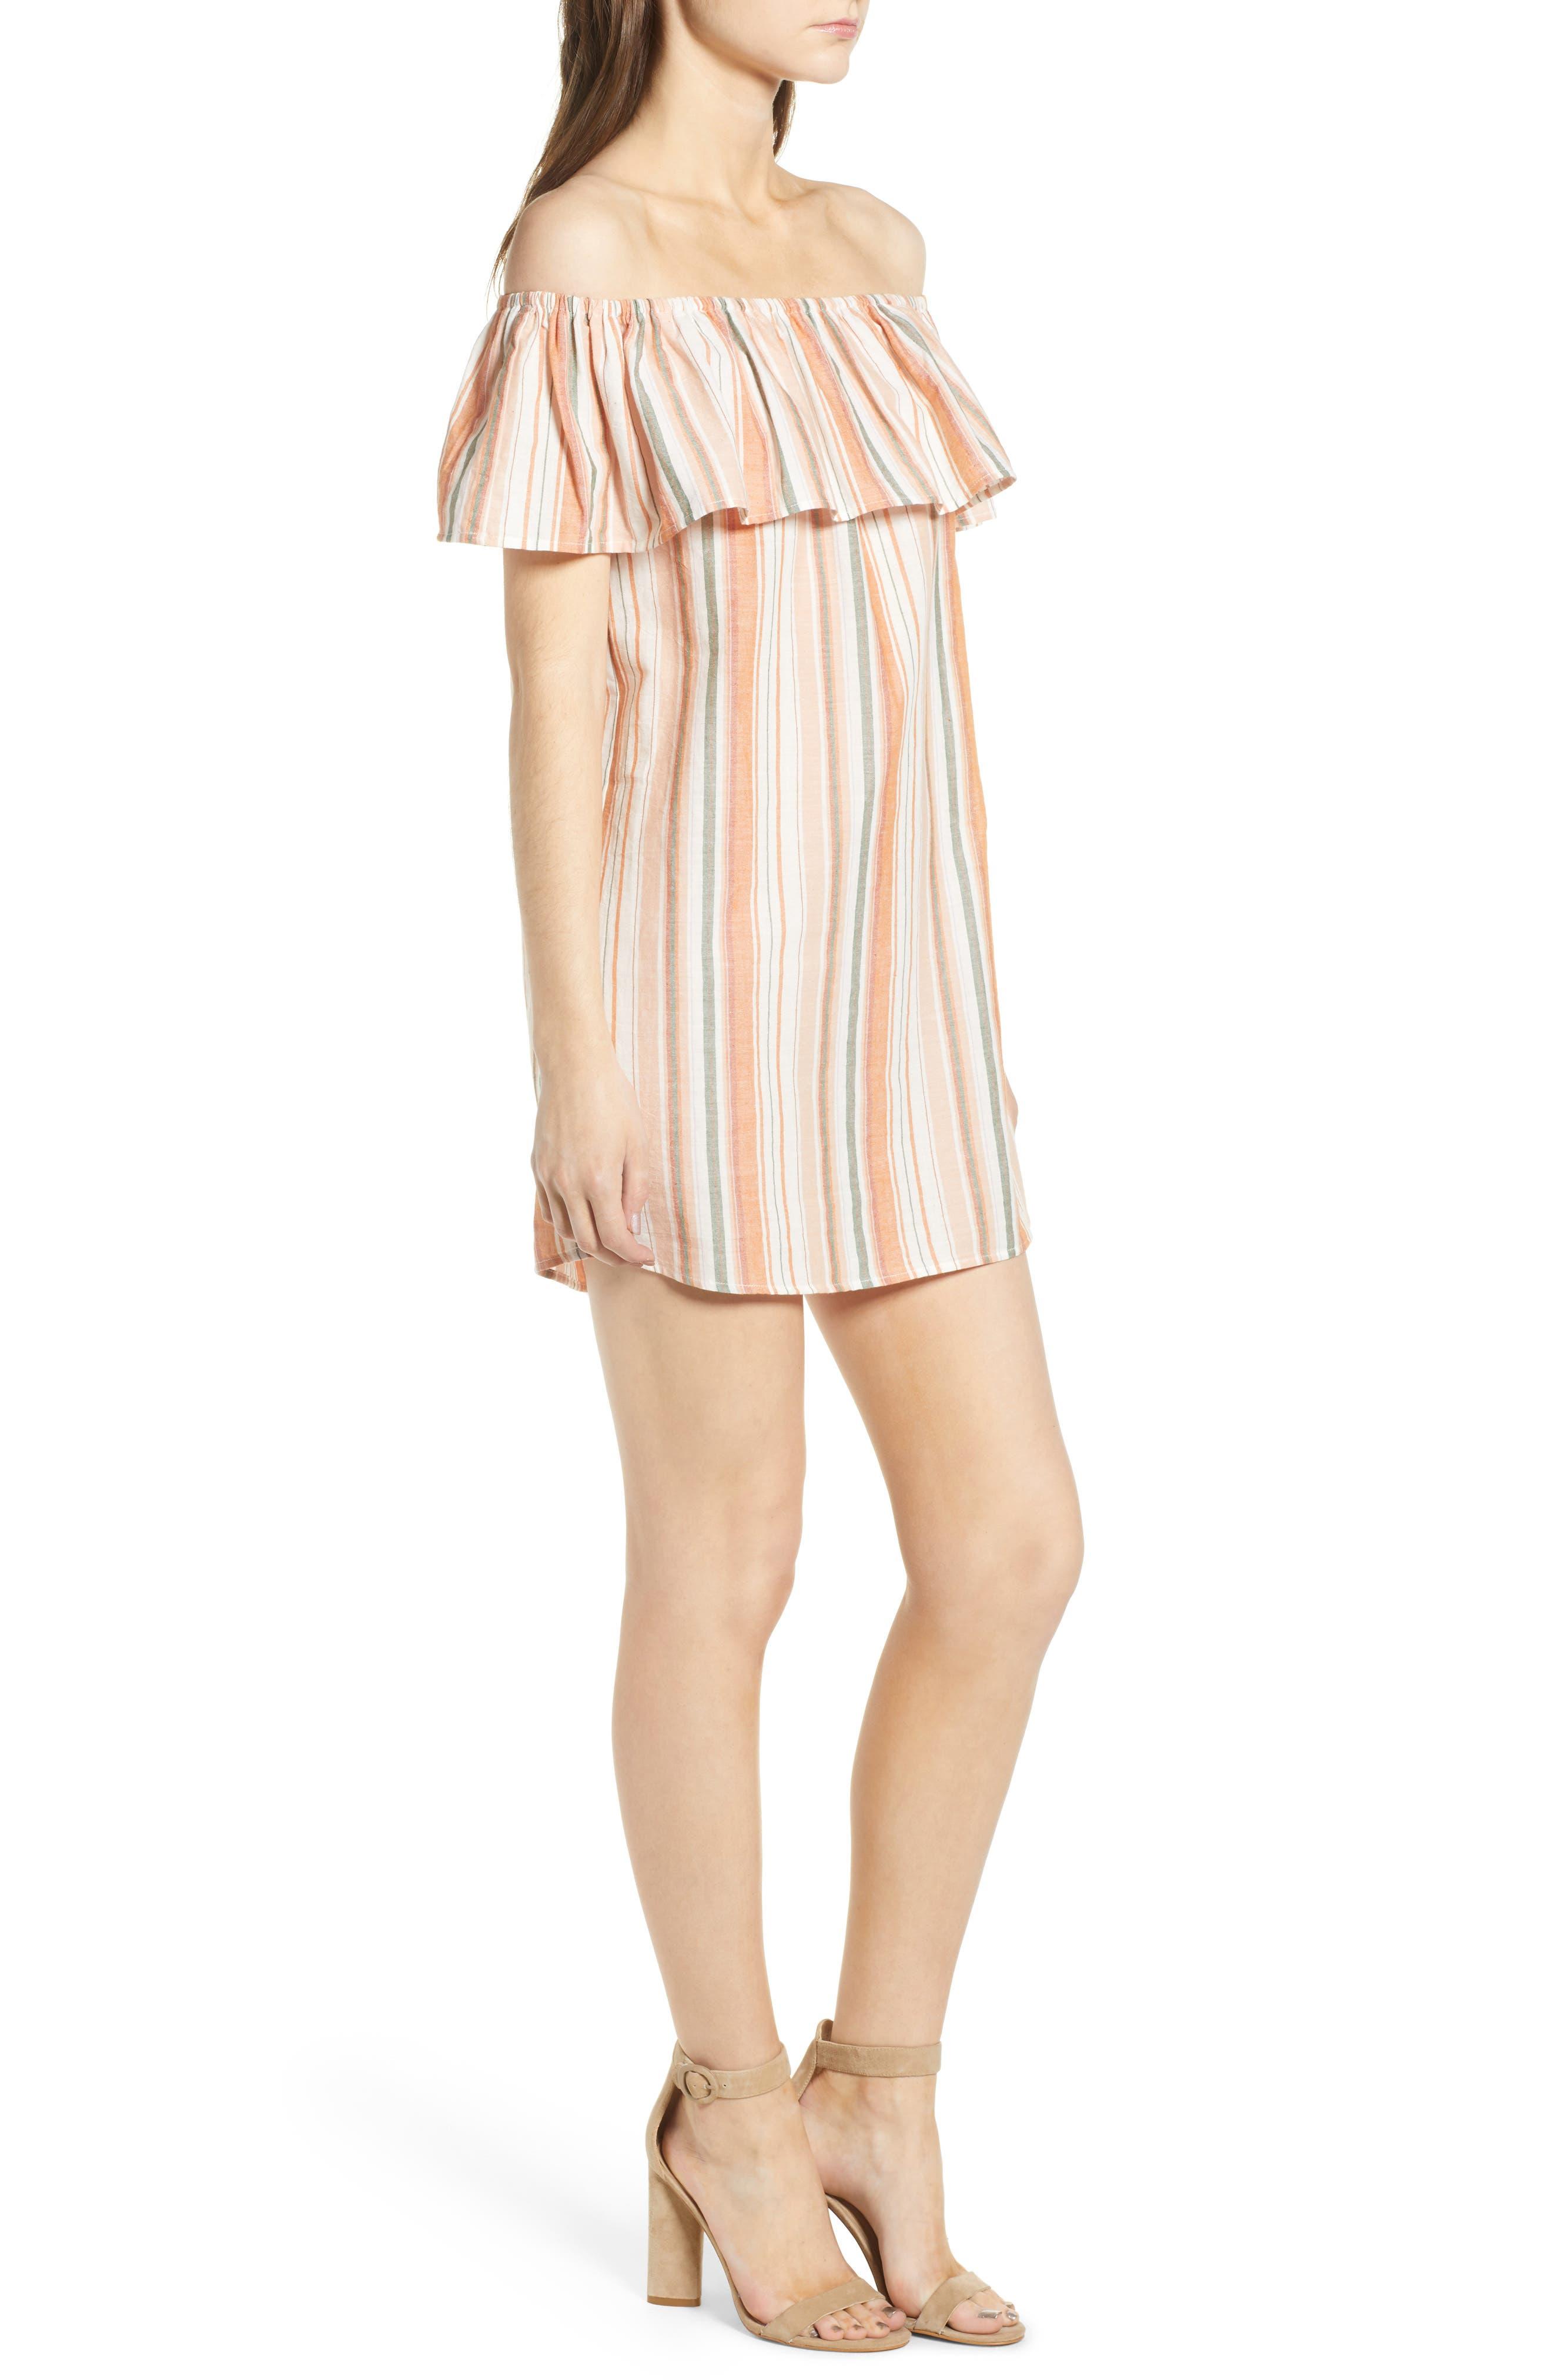 Bishop + Young Sunset Stripe Off the Shoulder Dress,                             Alternate thumbnail 3, color,                             Orange White Stripe